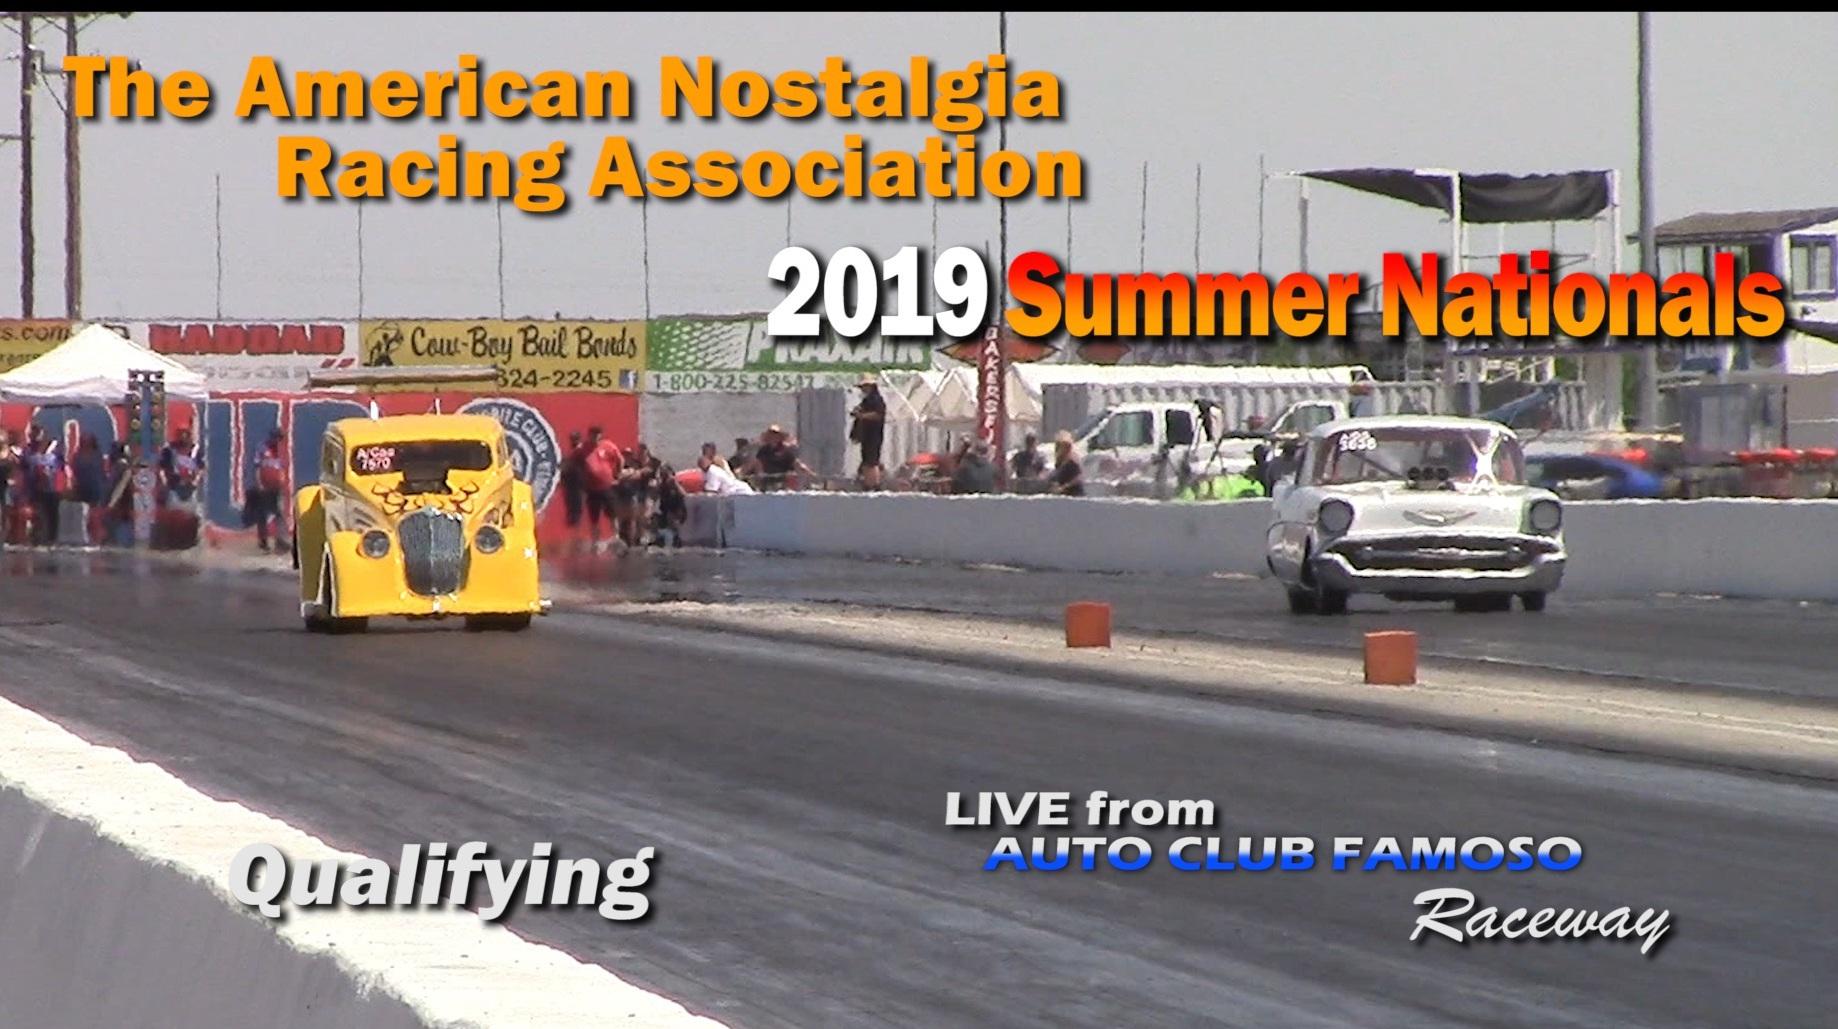 ANRA 2019 Summer Nationals Qualifying on Livestream